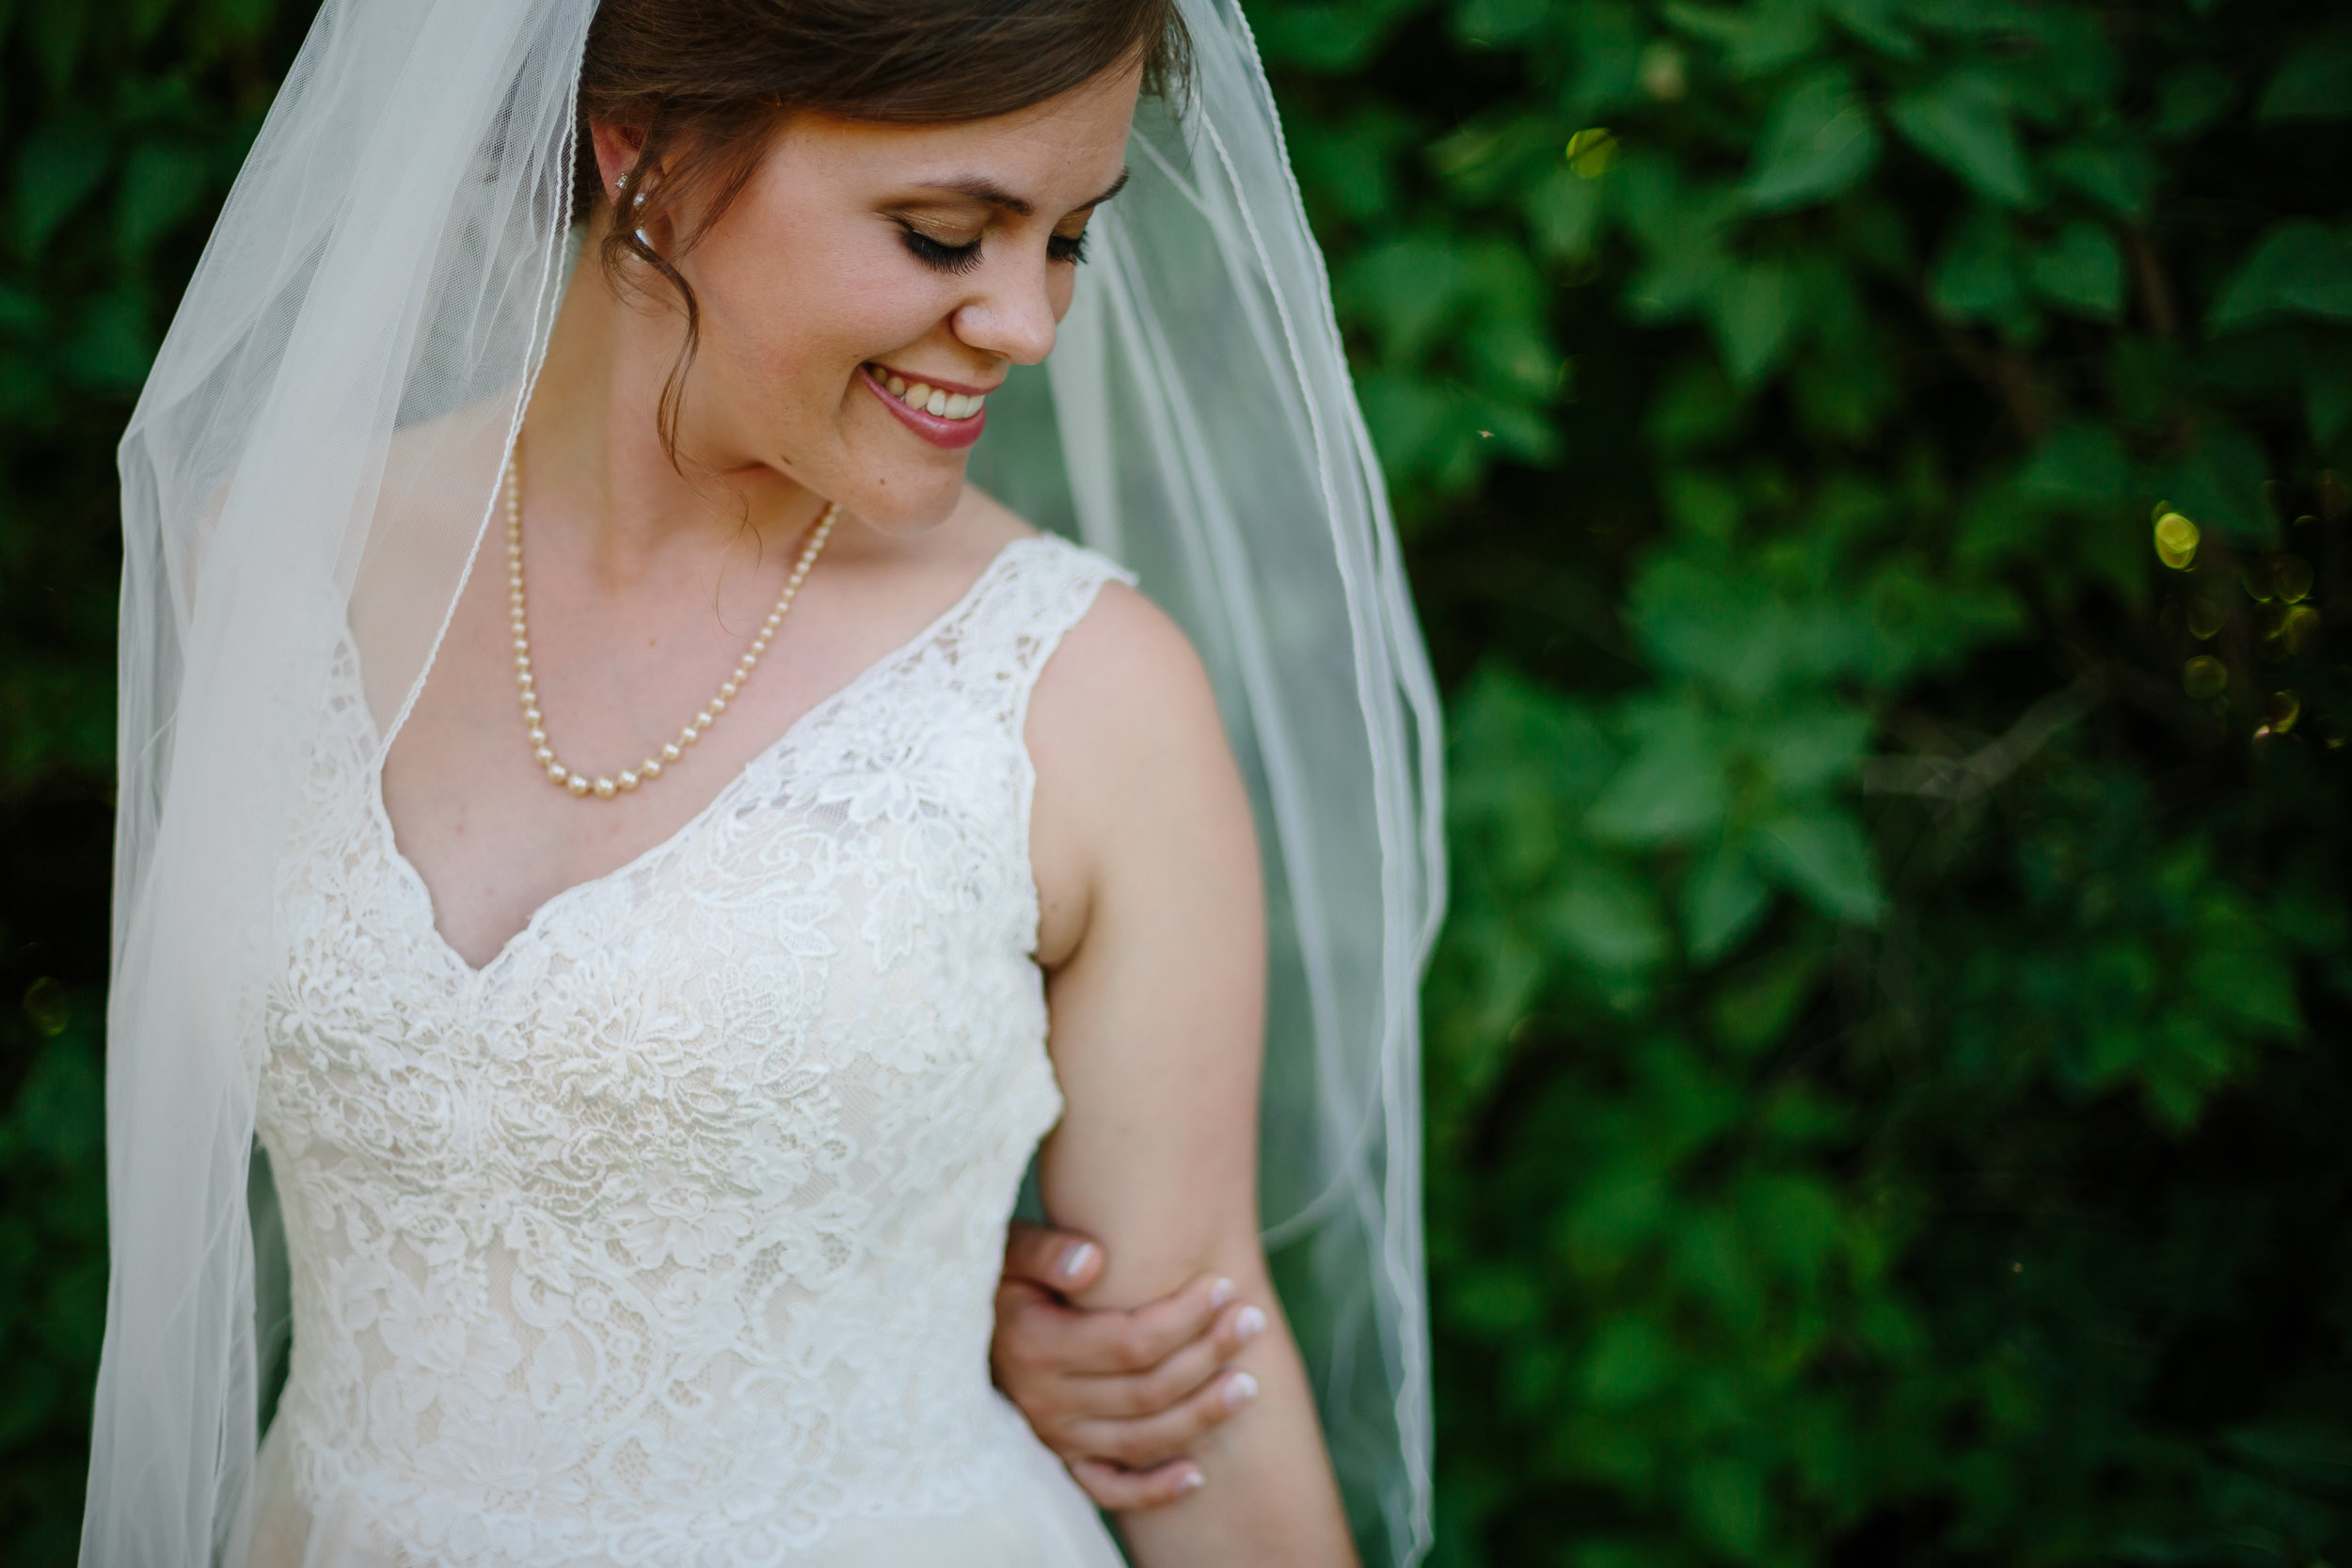 Jordan & Shantel Married - Idaho - Corrie Mick Photography-185.jpg